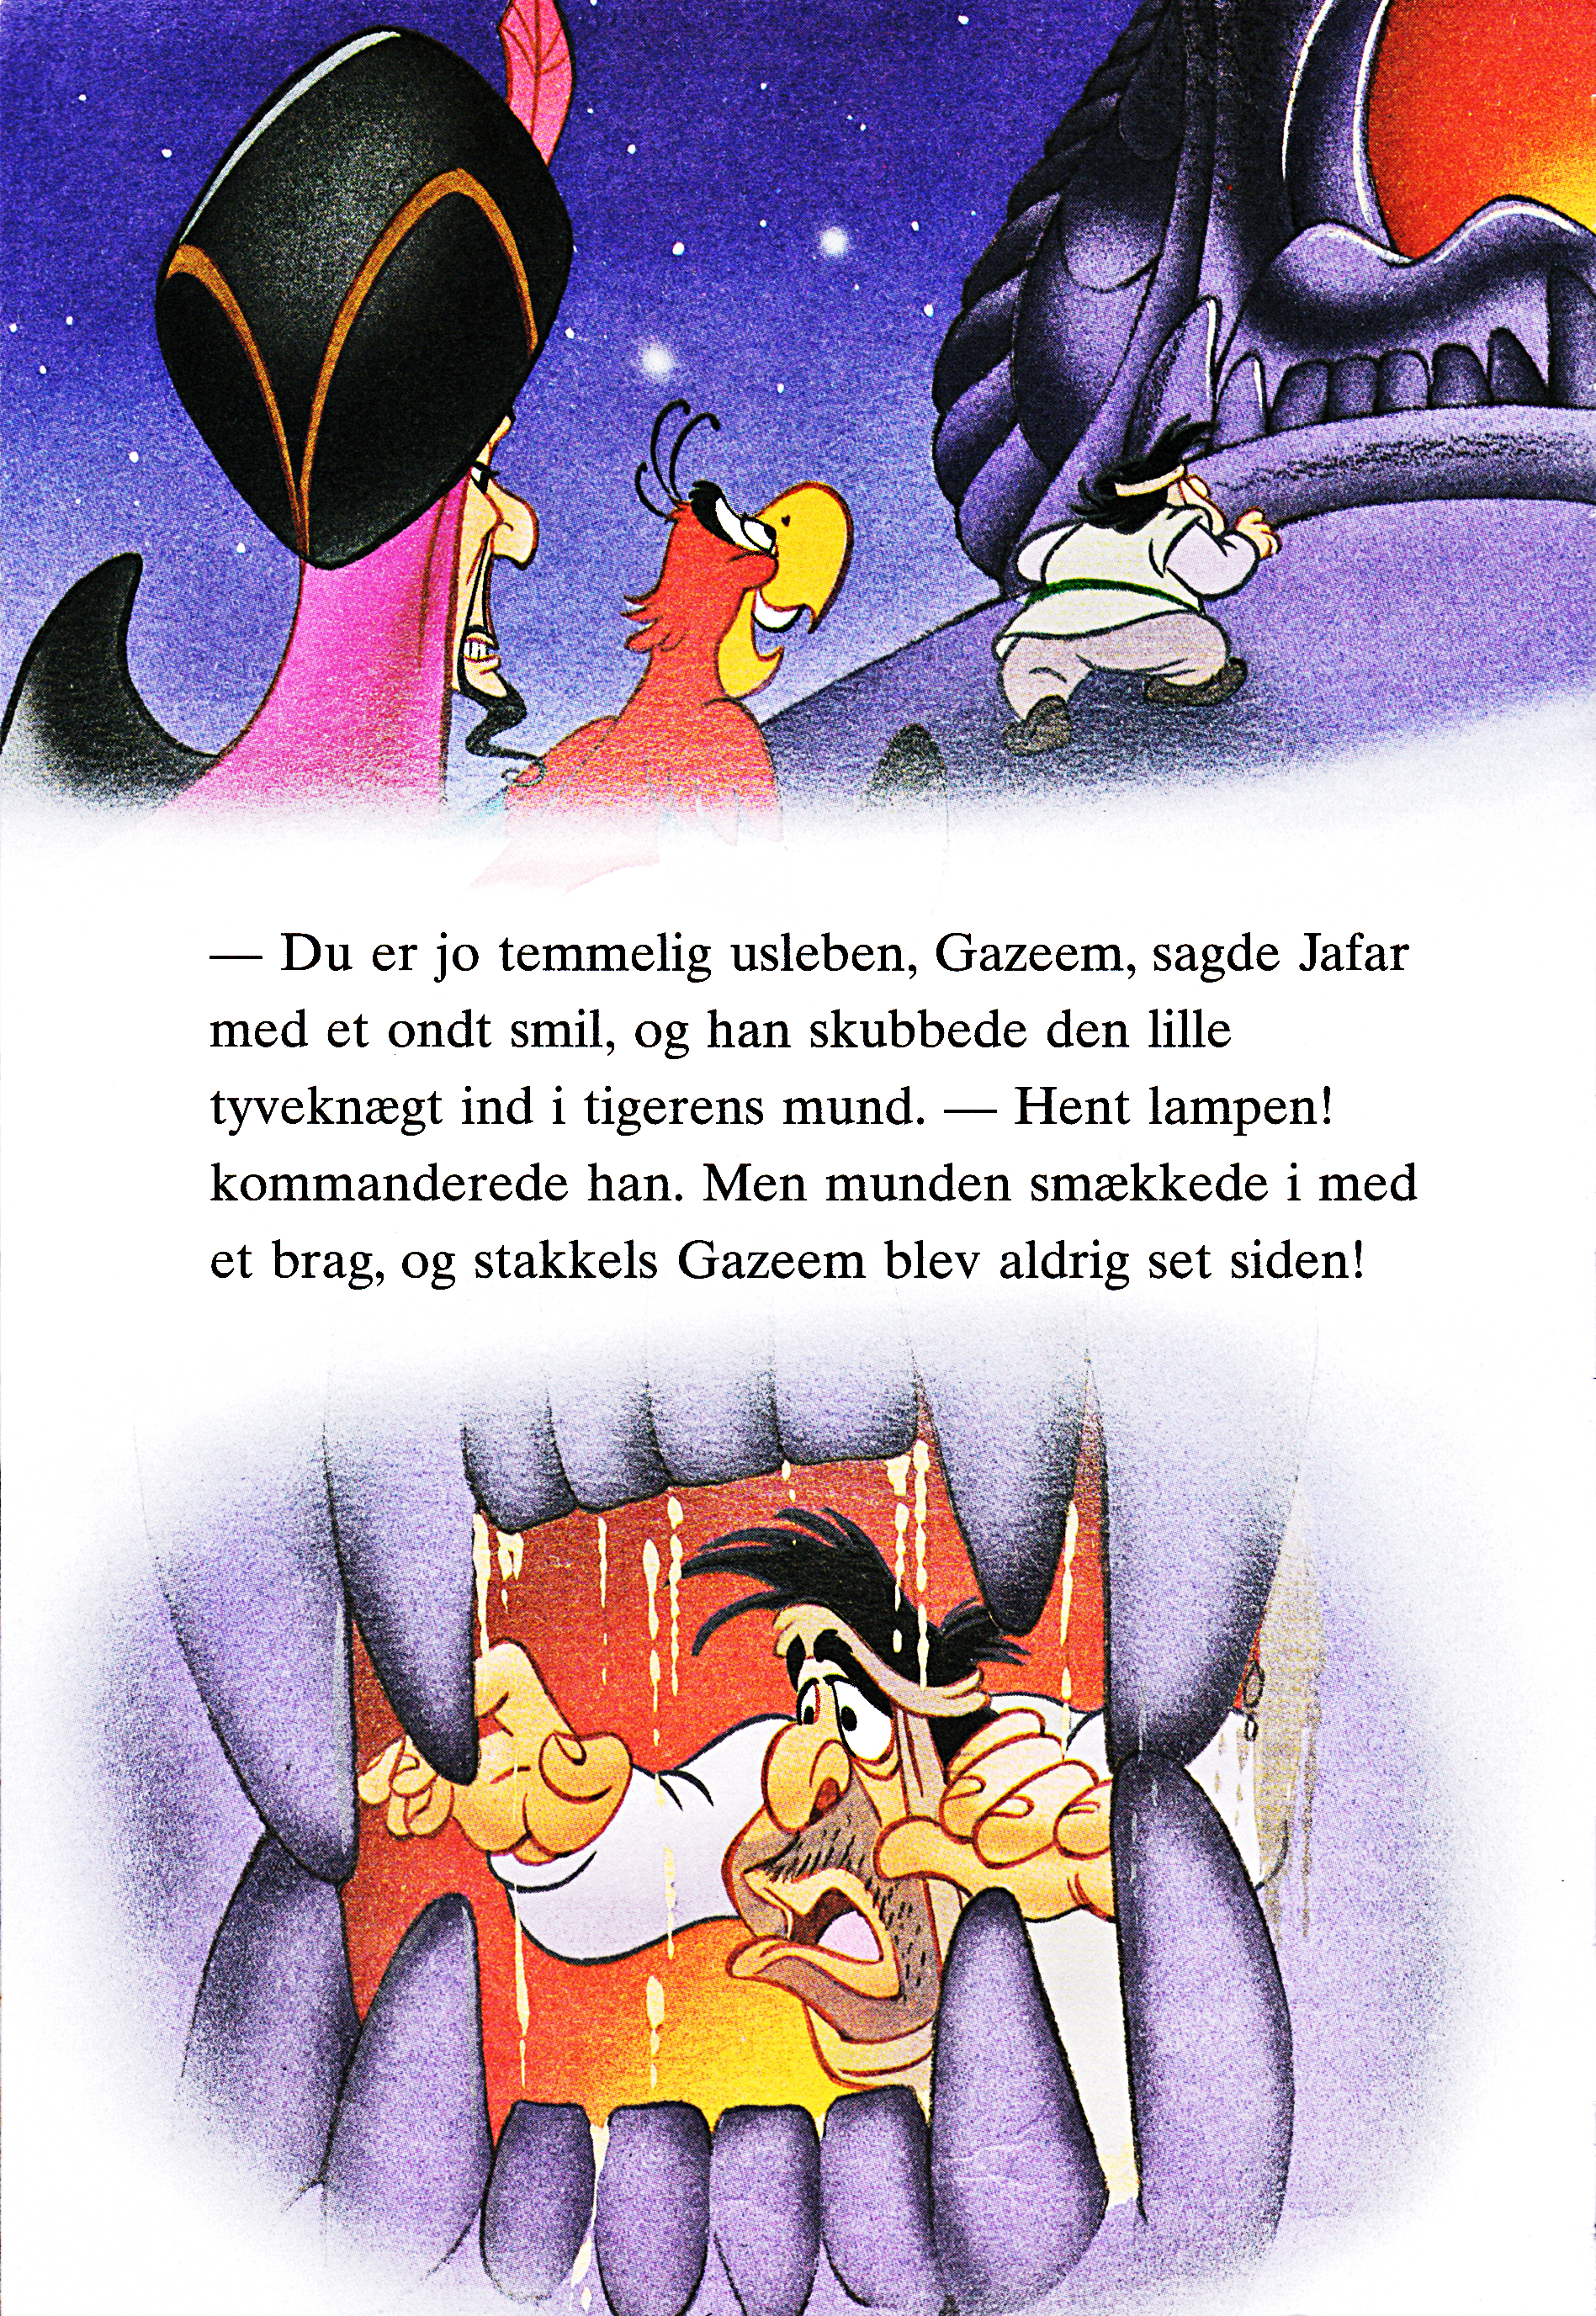 Walt 迪士尼 Book 图片 - Jafar Iago & Gazeem